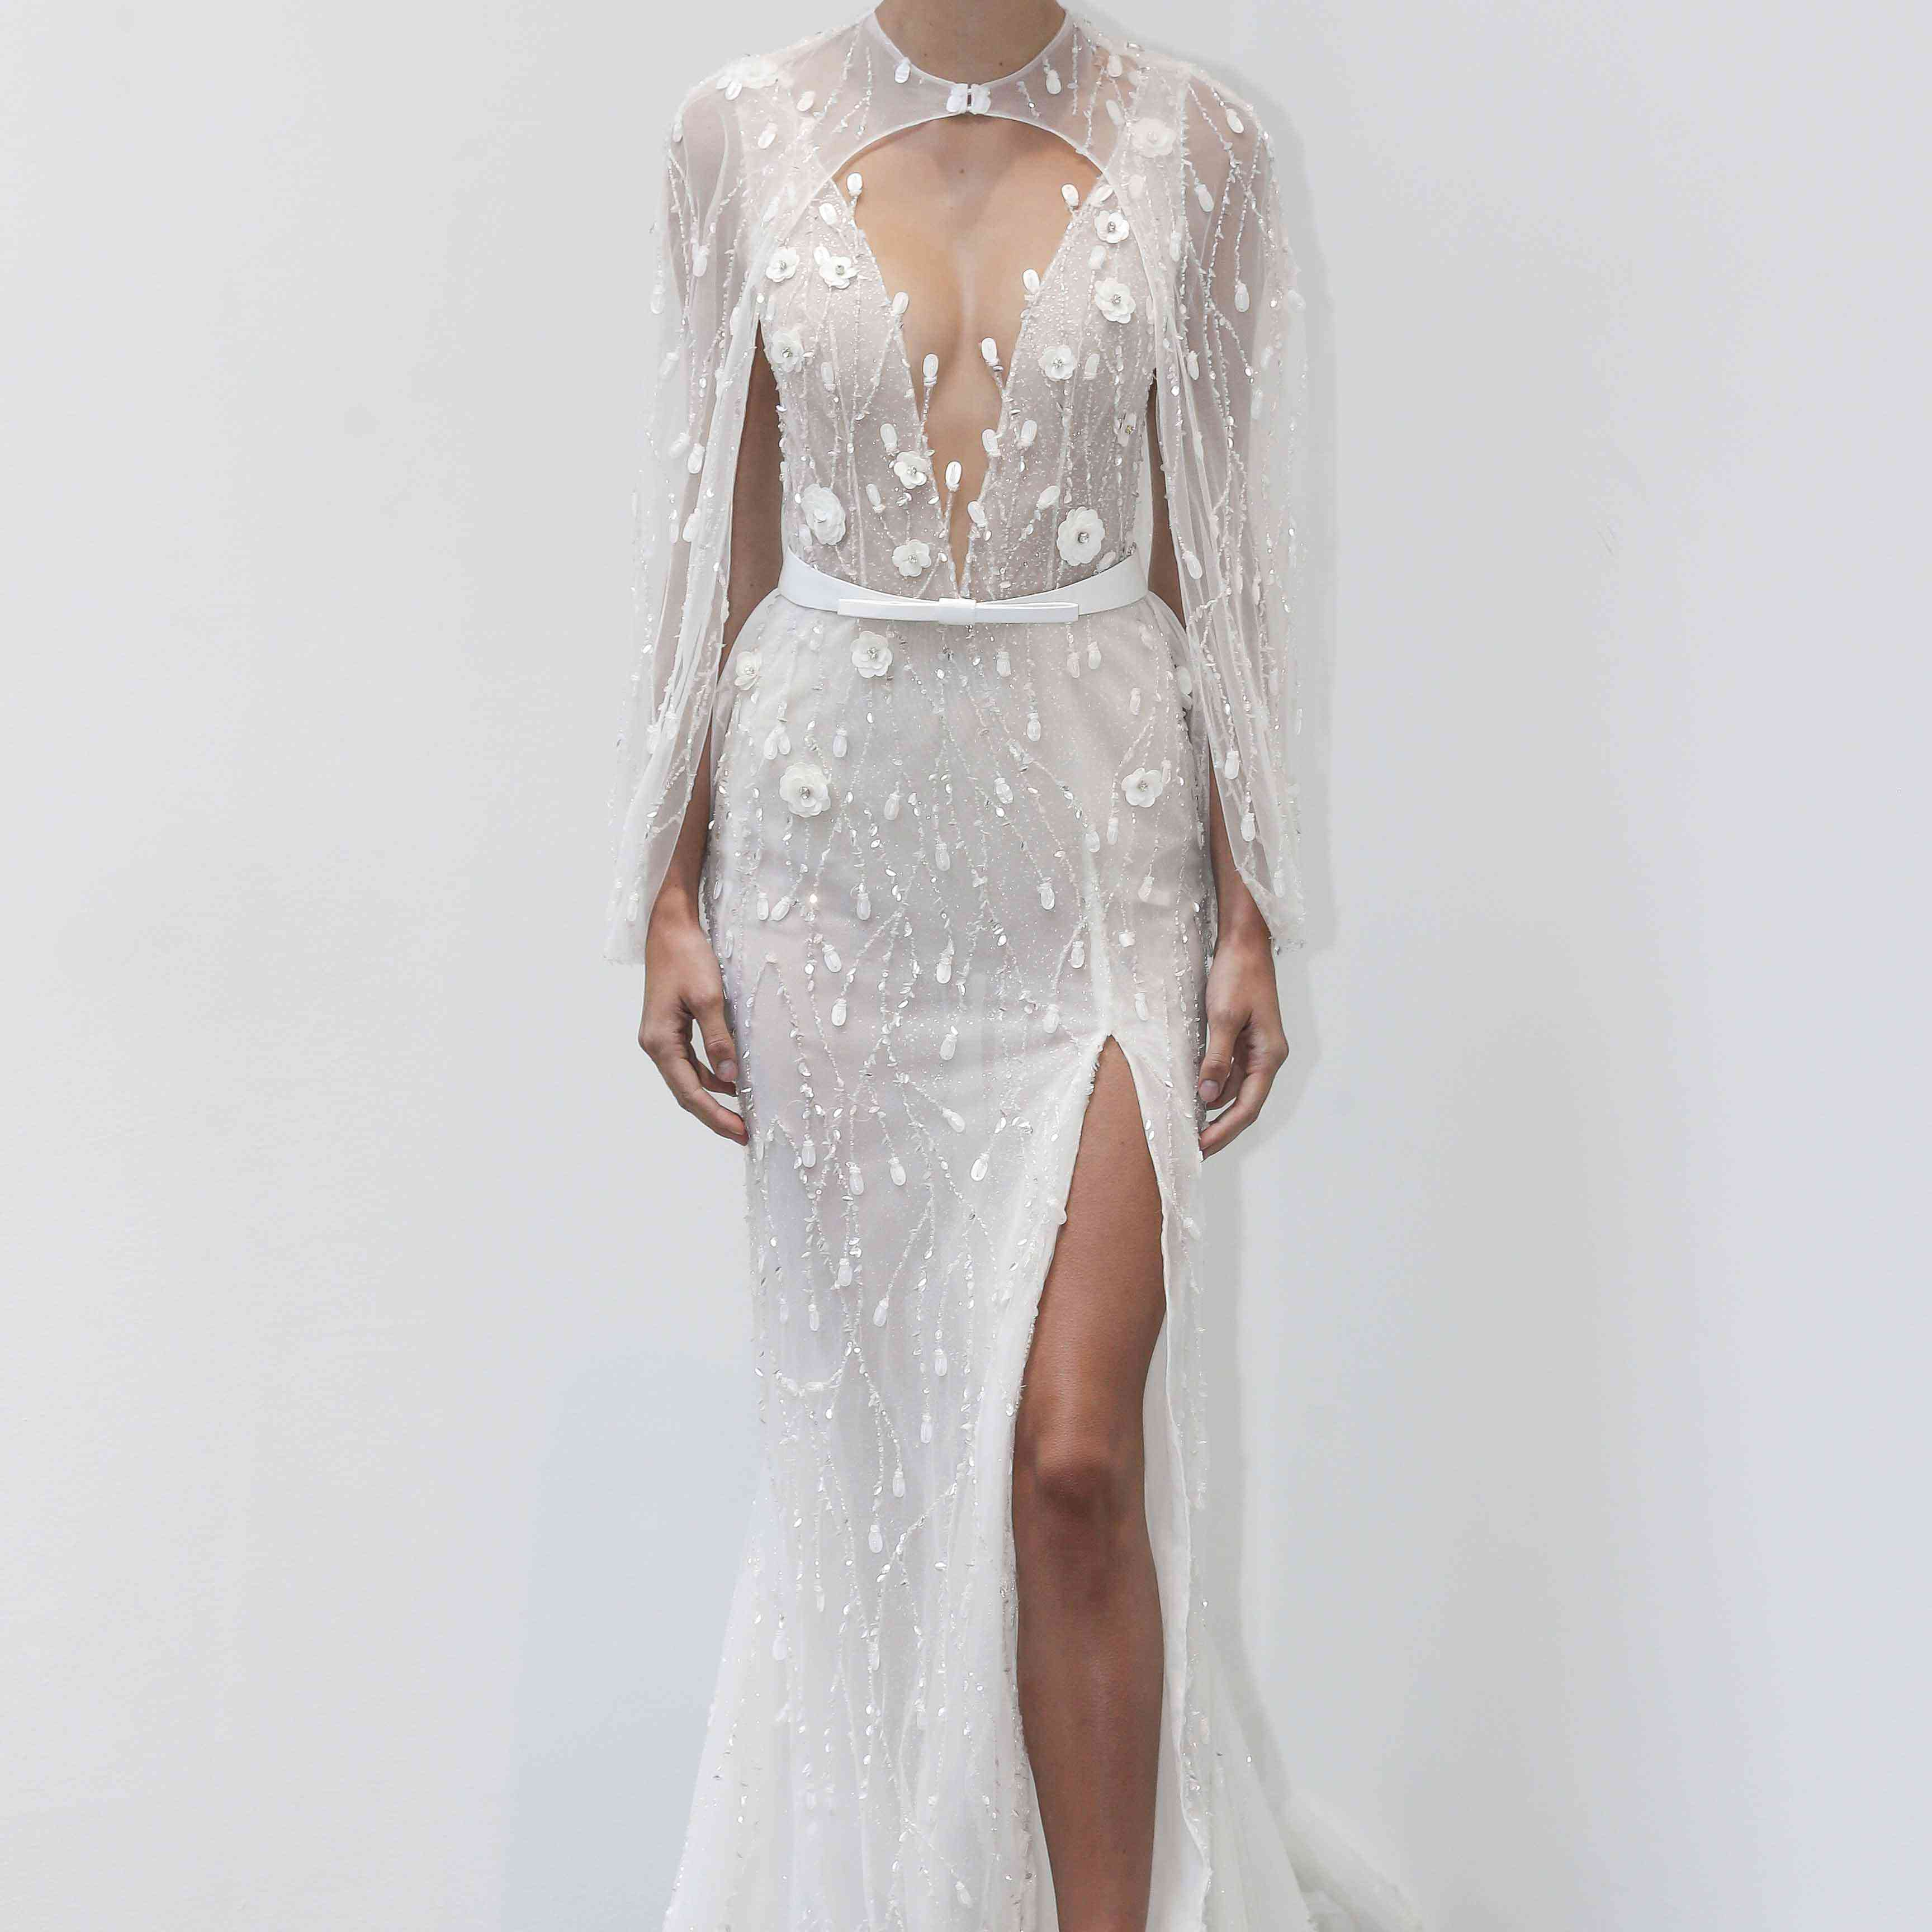 Mia sleeveless wedding dress